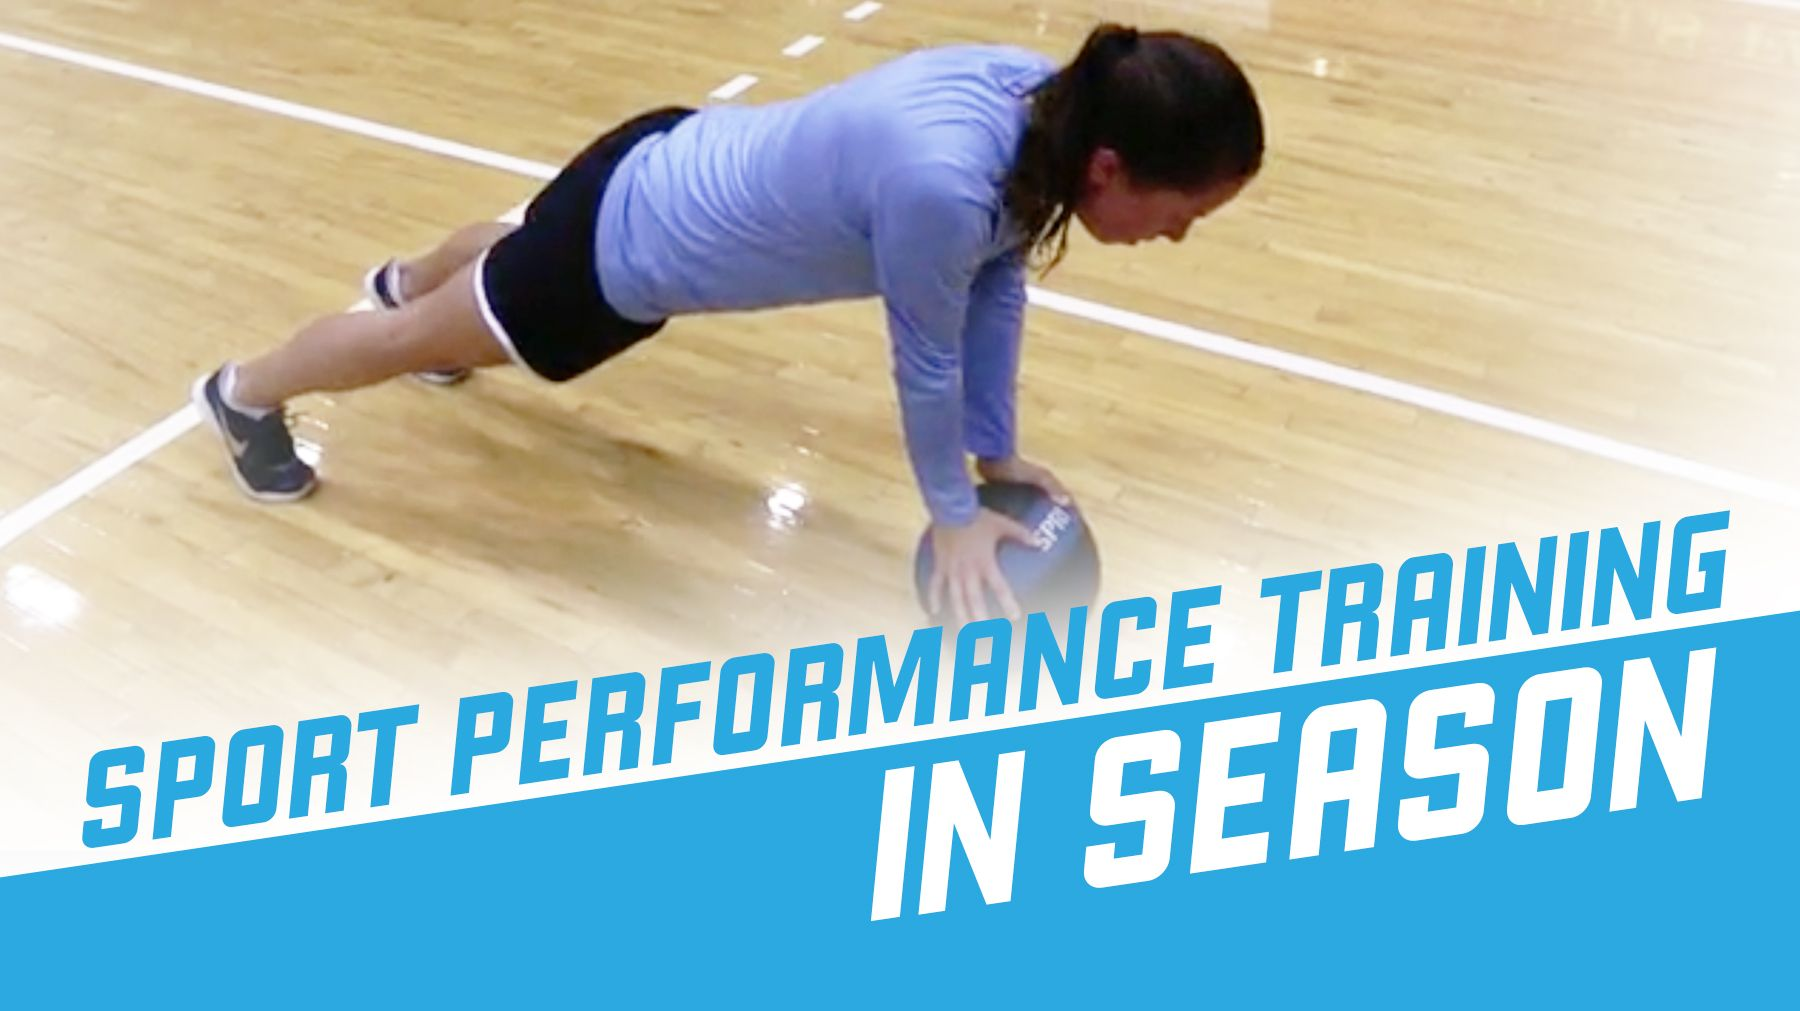 Volleyball sport performance training In season